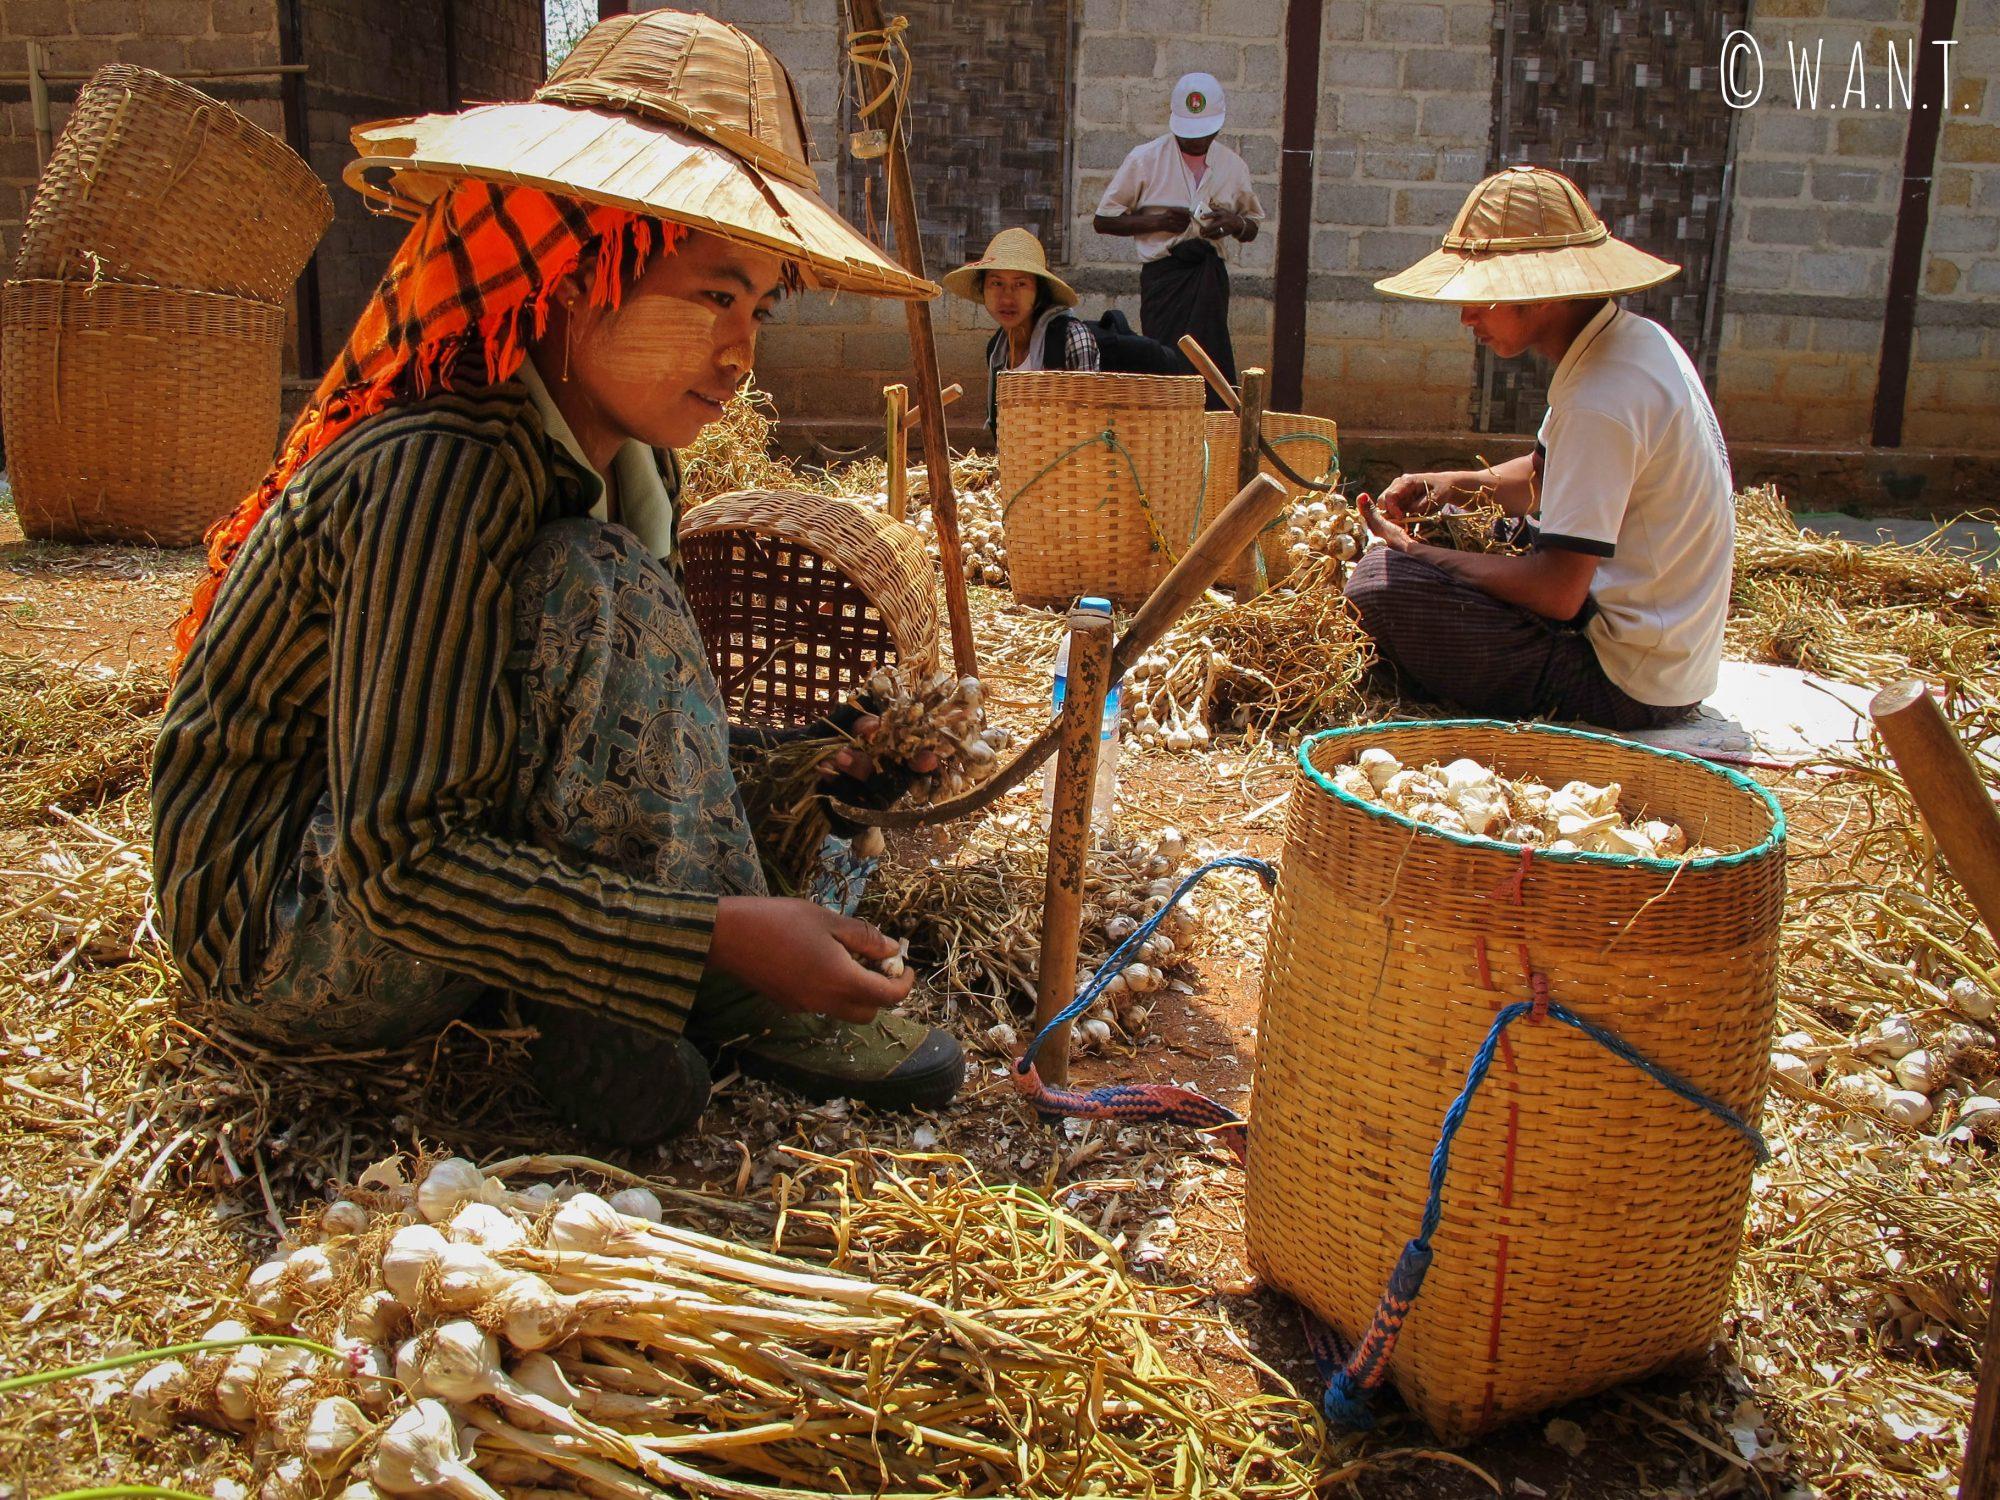 La famille de notre guide, Nambo, cultive de l'ail